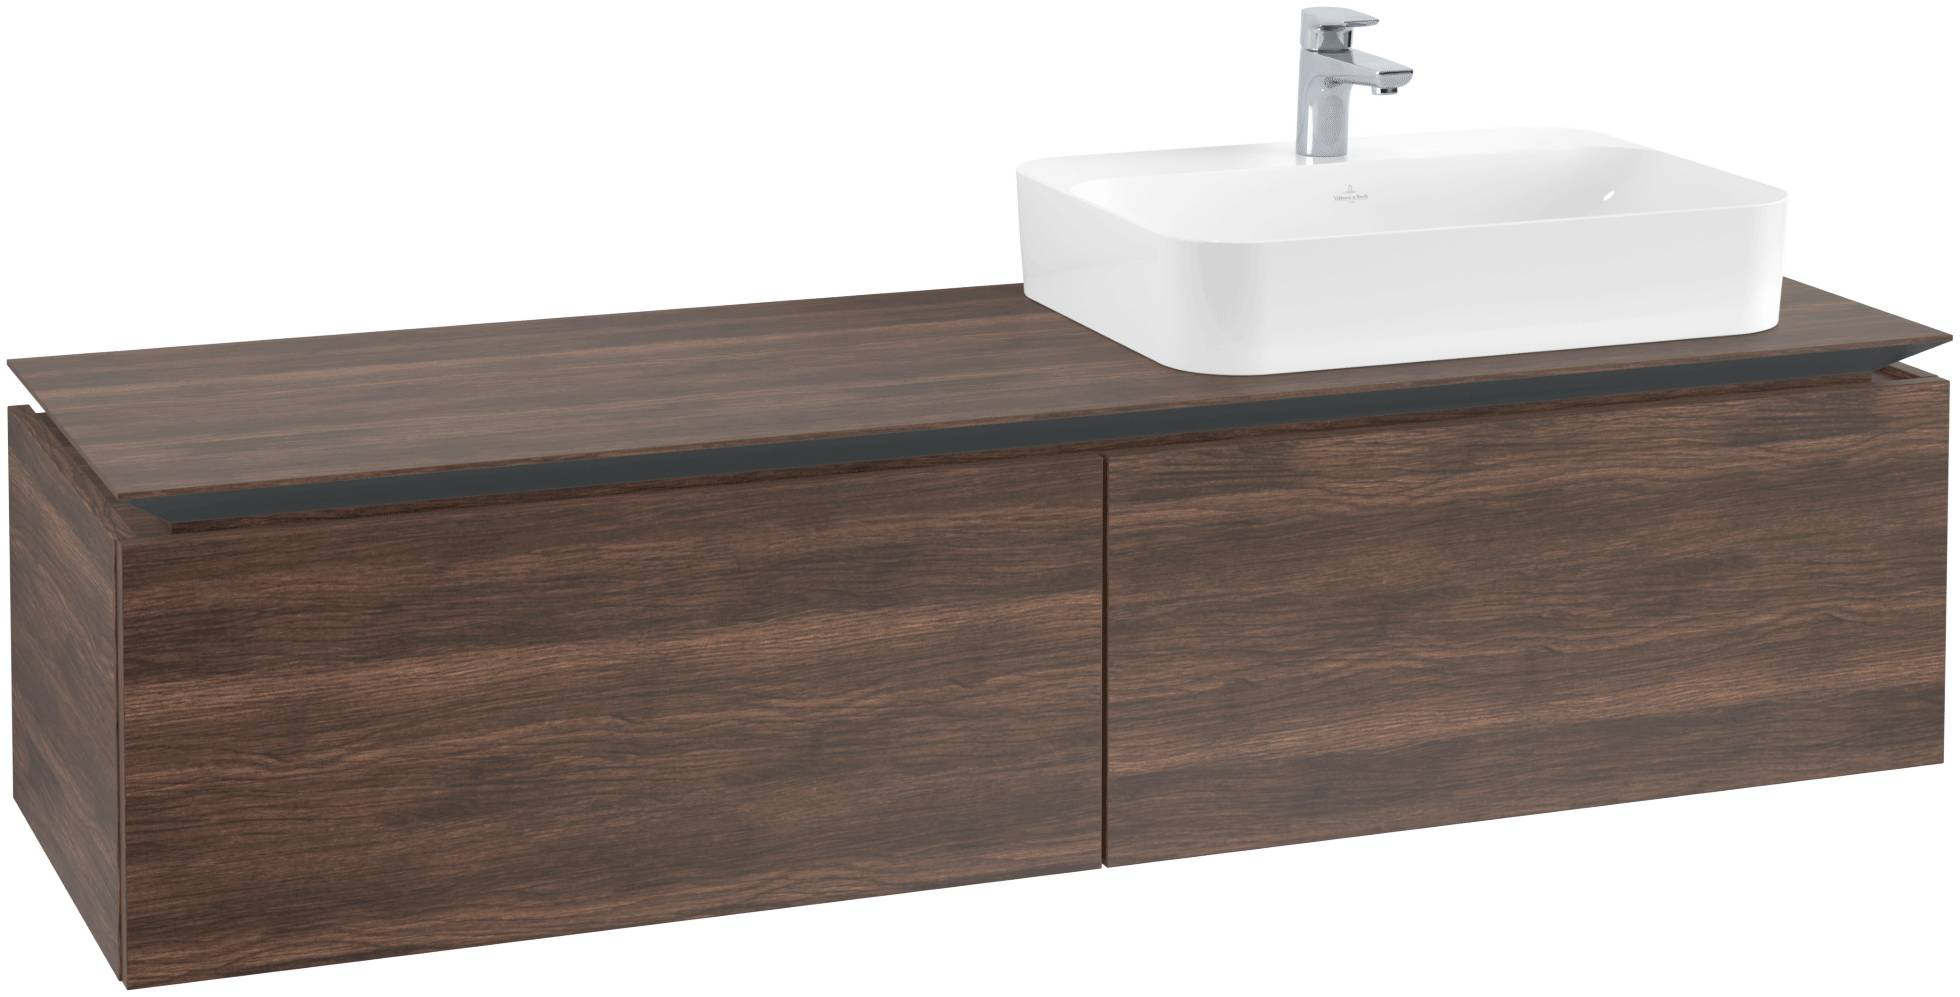 Villeroy & Boch Villeroy & Boch Legato - Meuble sous lavabo with 2 drawers & 1 cut-out right 1600 x 380 x 500mm arizona oak